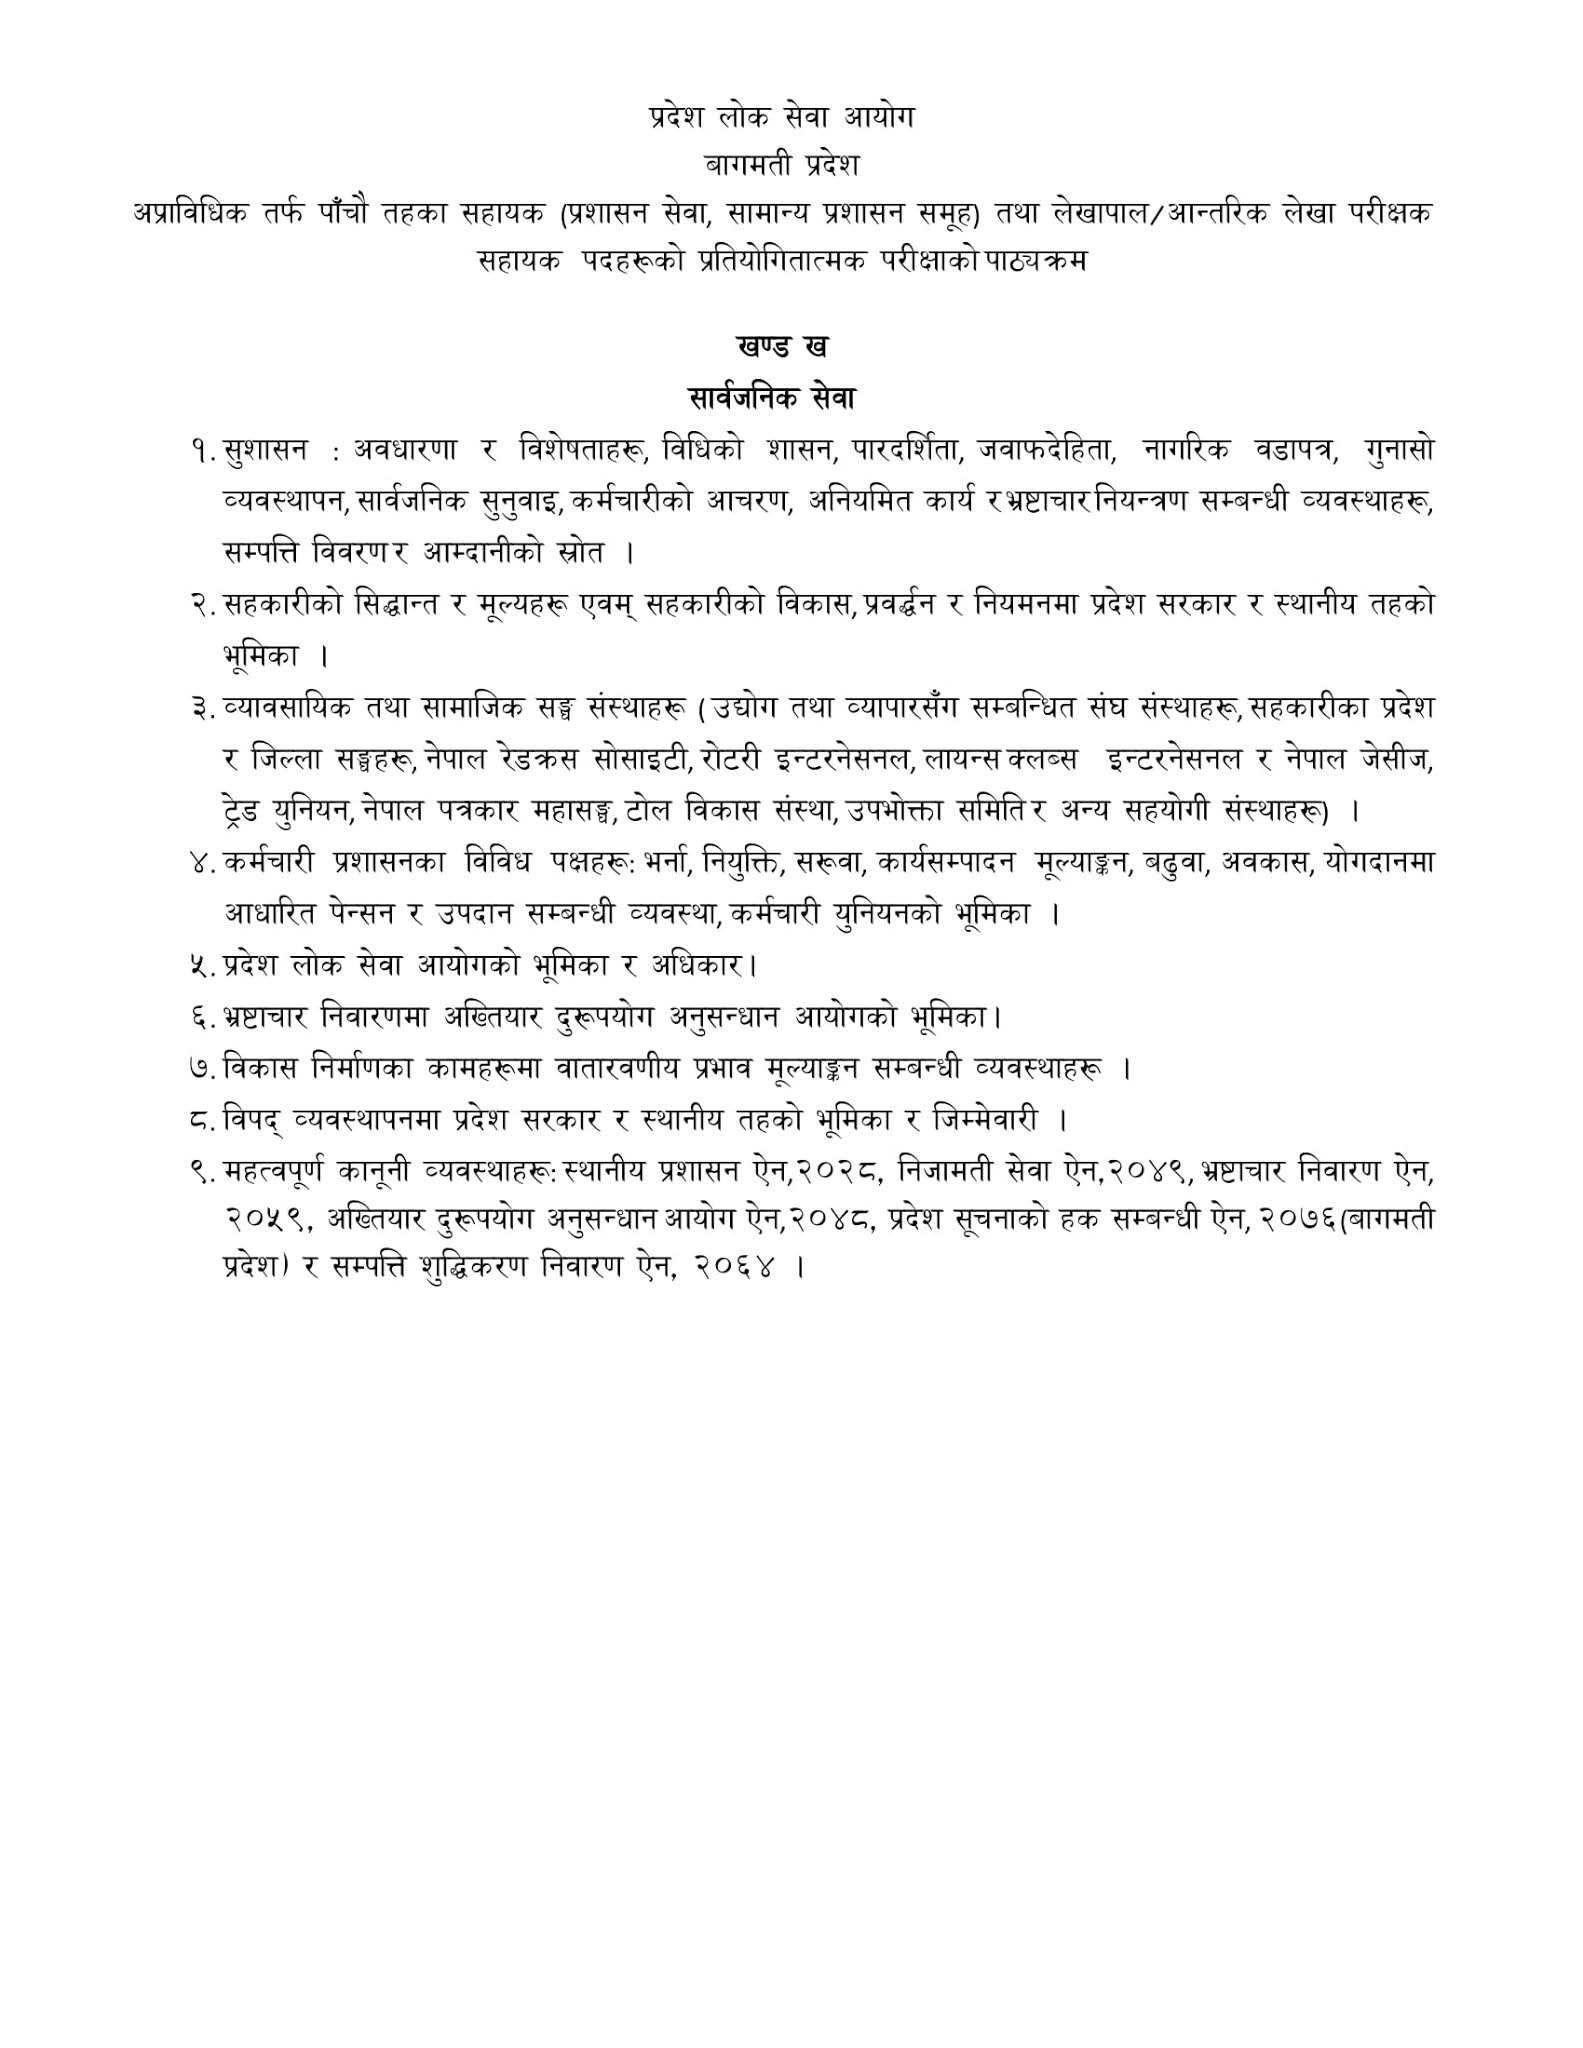 Bagmati Pradesh Assistant 5th Level Non Technical Syllables बागमती प्रदेश अप्राविधिक सहायक तह ५ पाठ्यक्रम